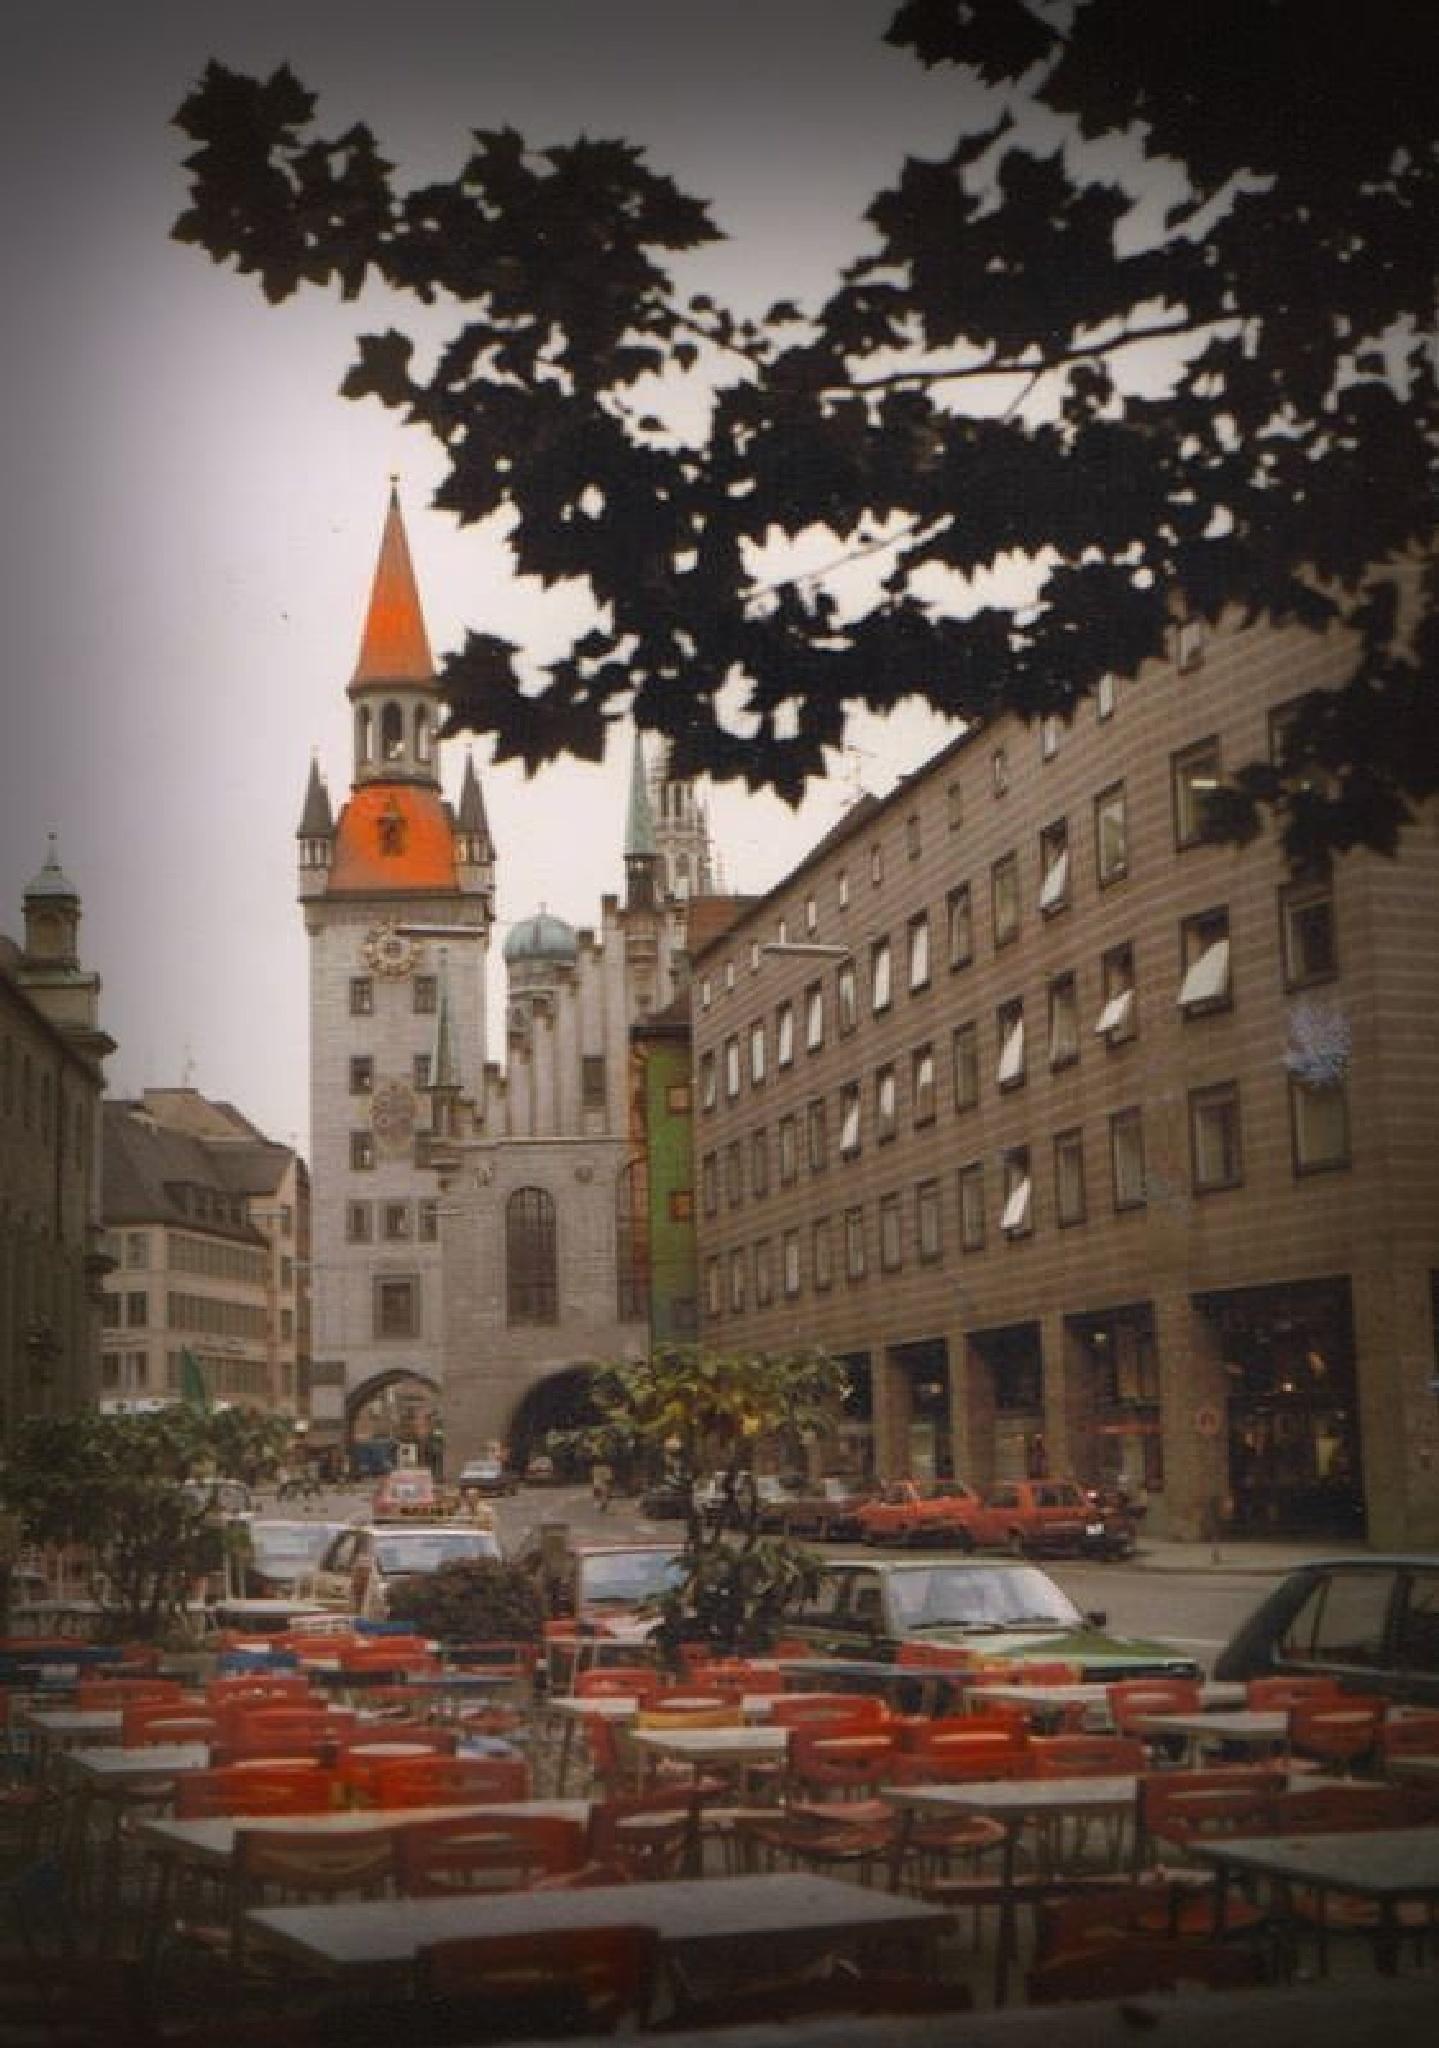 Münchner Straße by C michael anthony